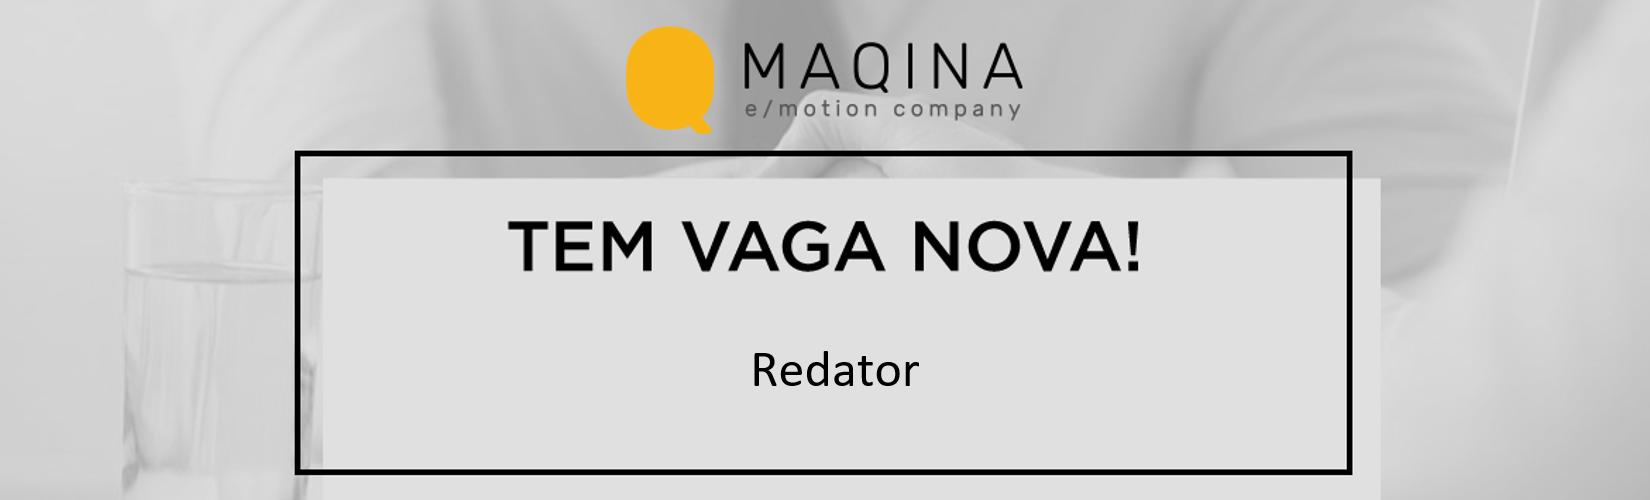 [MAQINA] - Redator